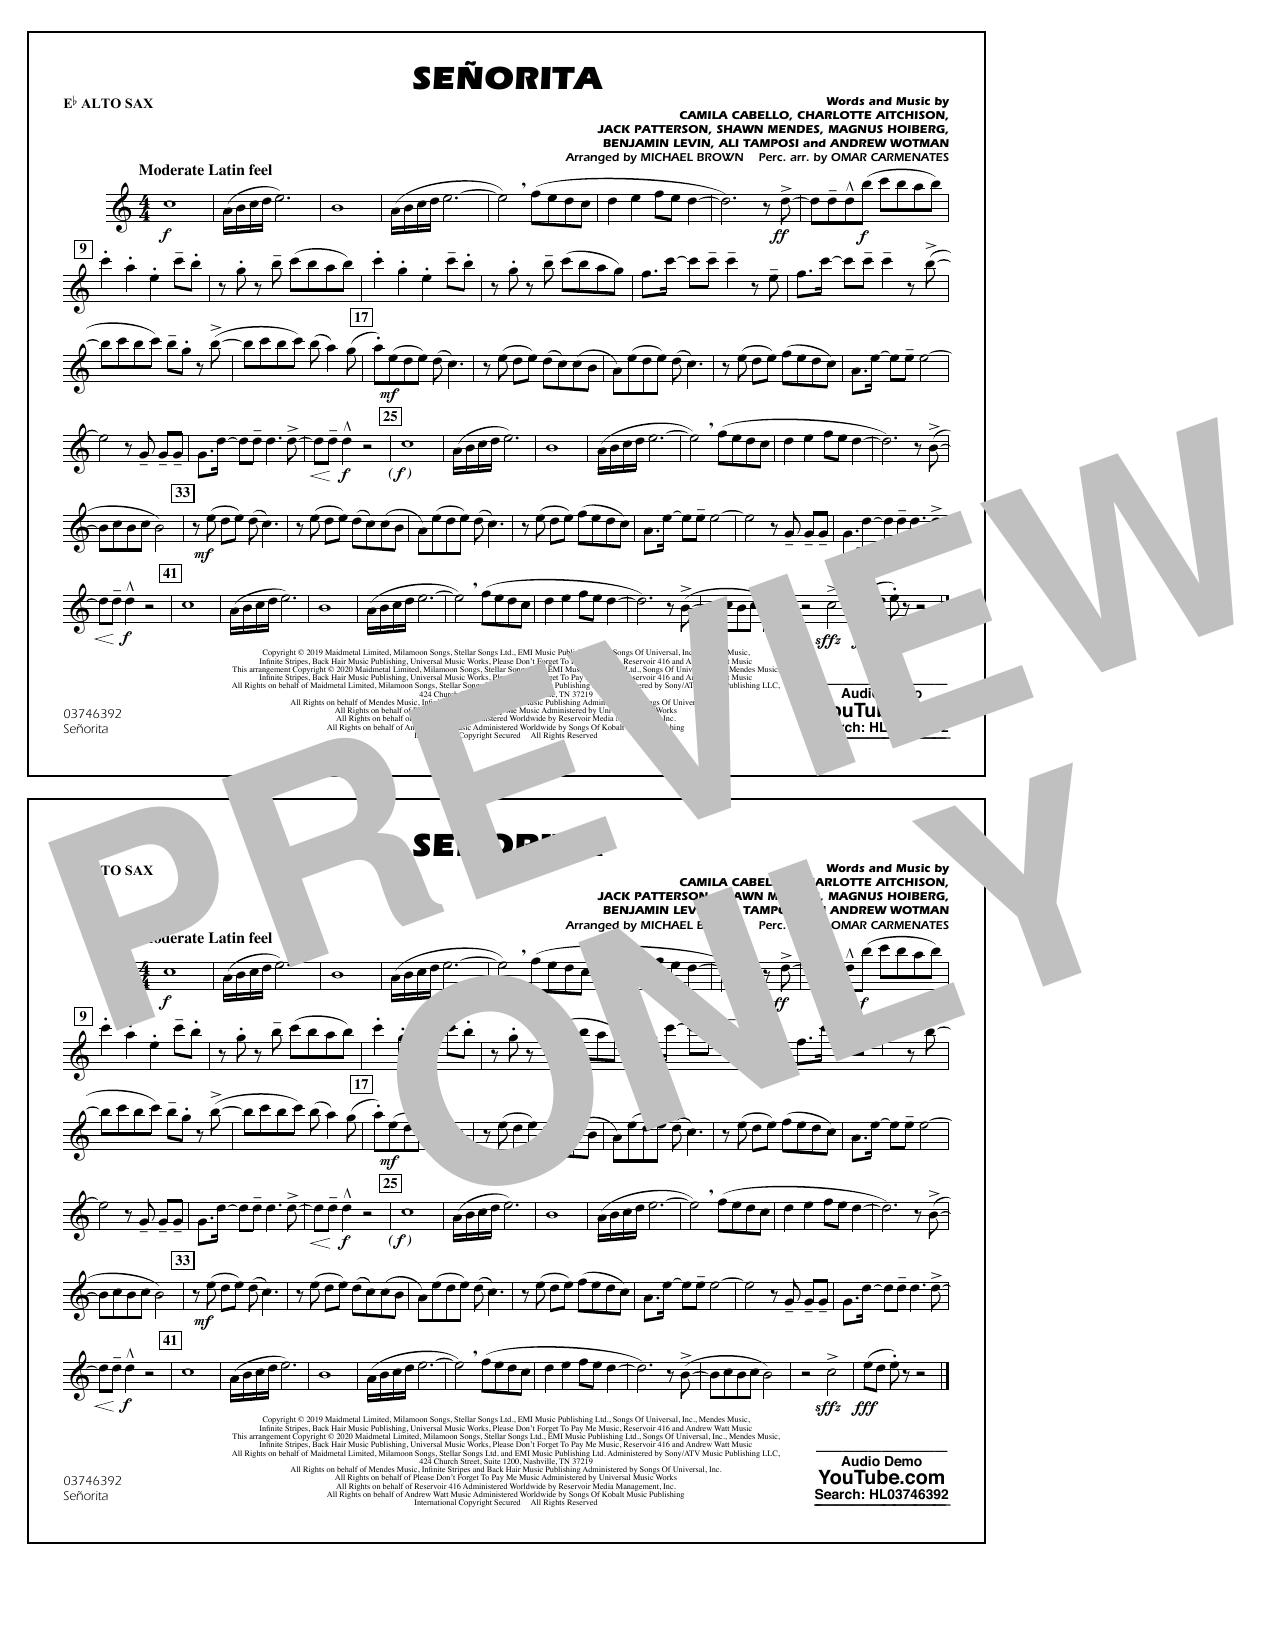 Señorita (arr. Carmenates and Brown) - Eb Alto Sax Sheet Music